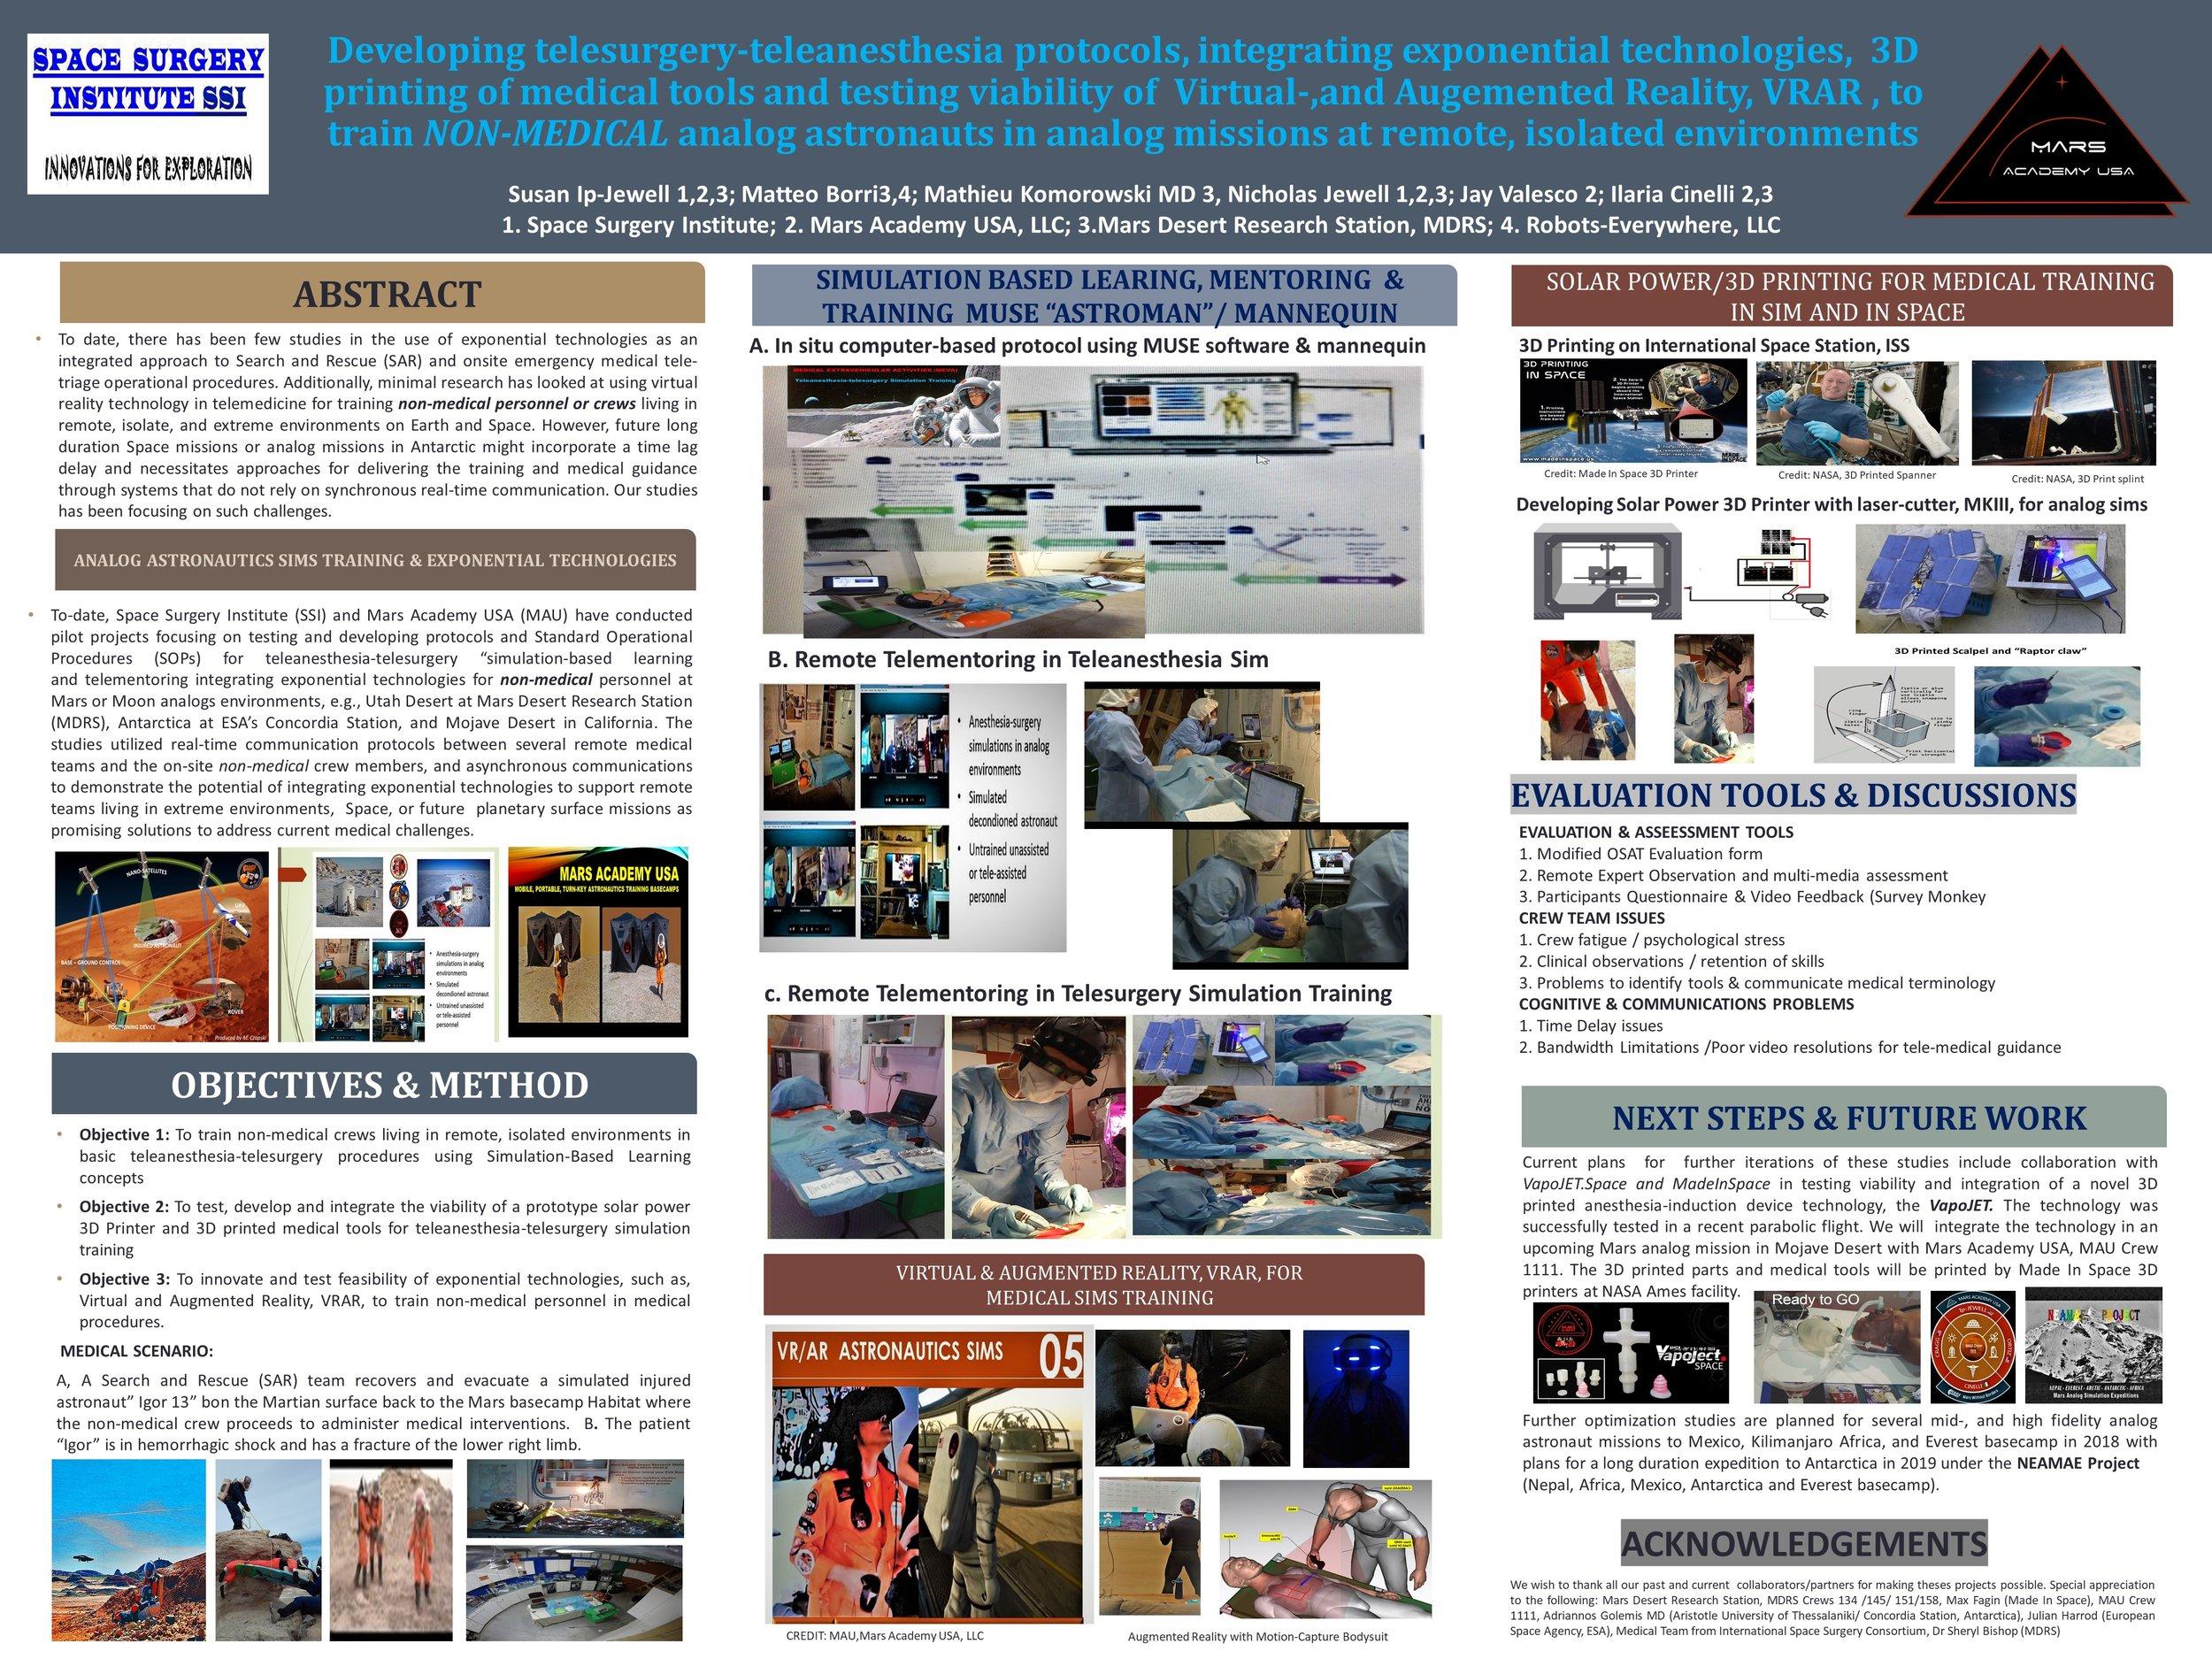 Teleannesthesia-telesurgery Sim Training_Poster.jpg